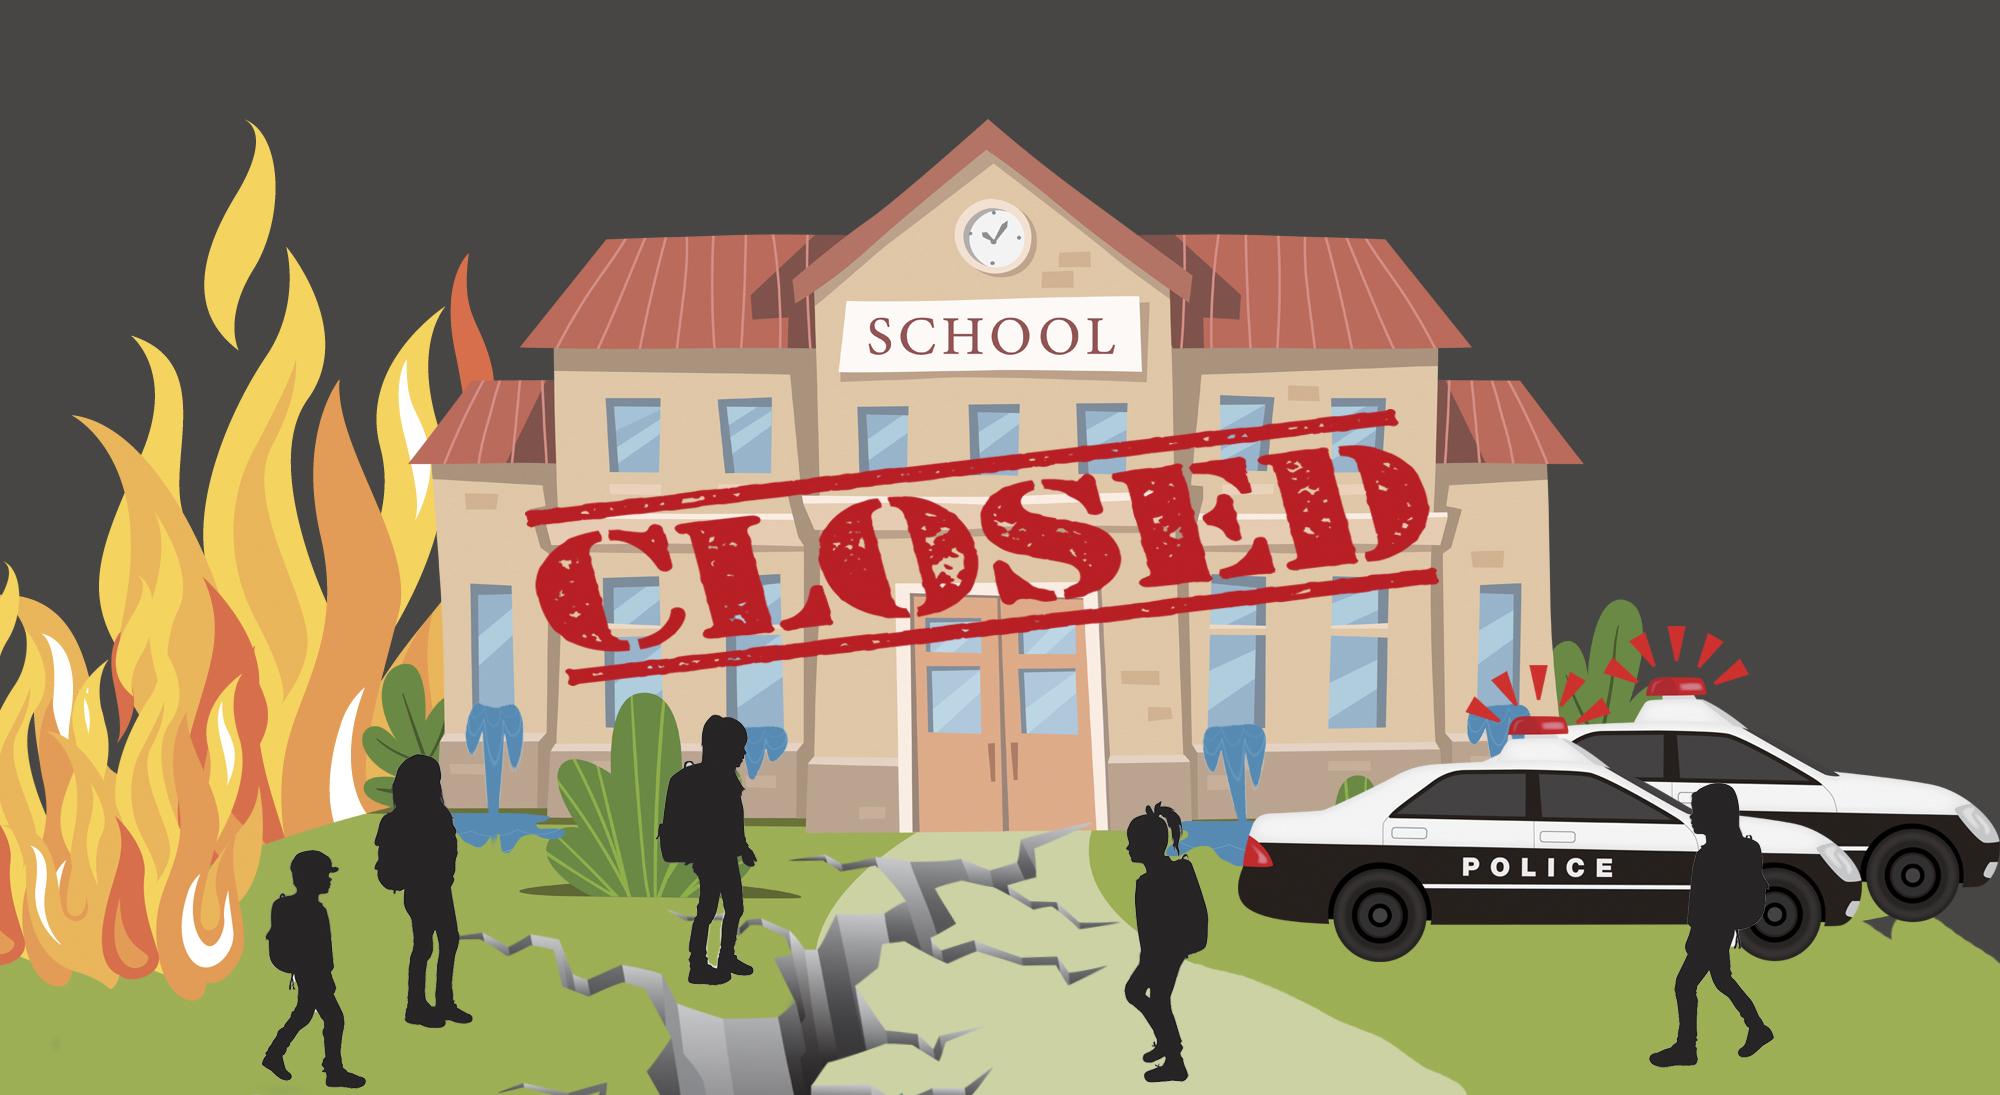 Disaster Days California Public School Closure Database 2002-2019. disaster days, school closures ; R-DESIGN/istock; syntika/istock; MilaArt/istock; NYstudio/istock; AlonzoDesign/istock; bortonia/istock